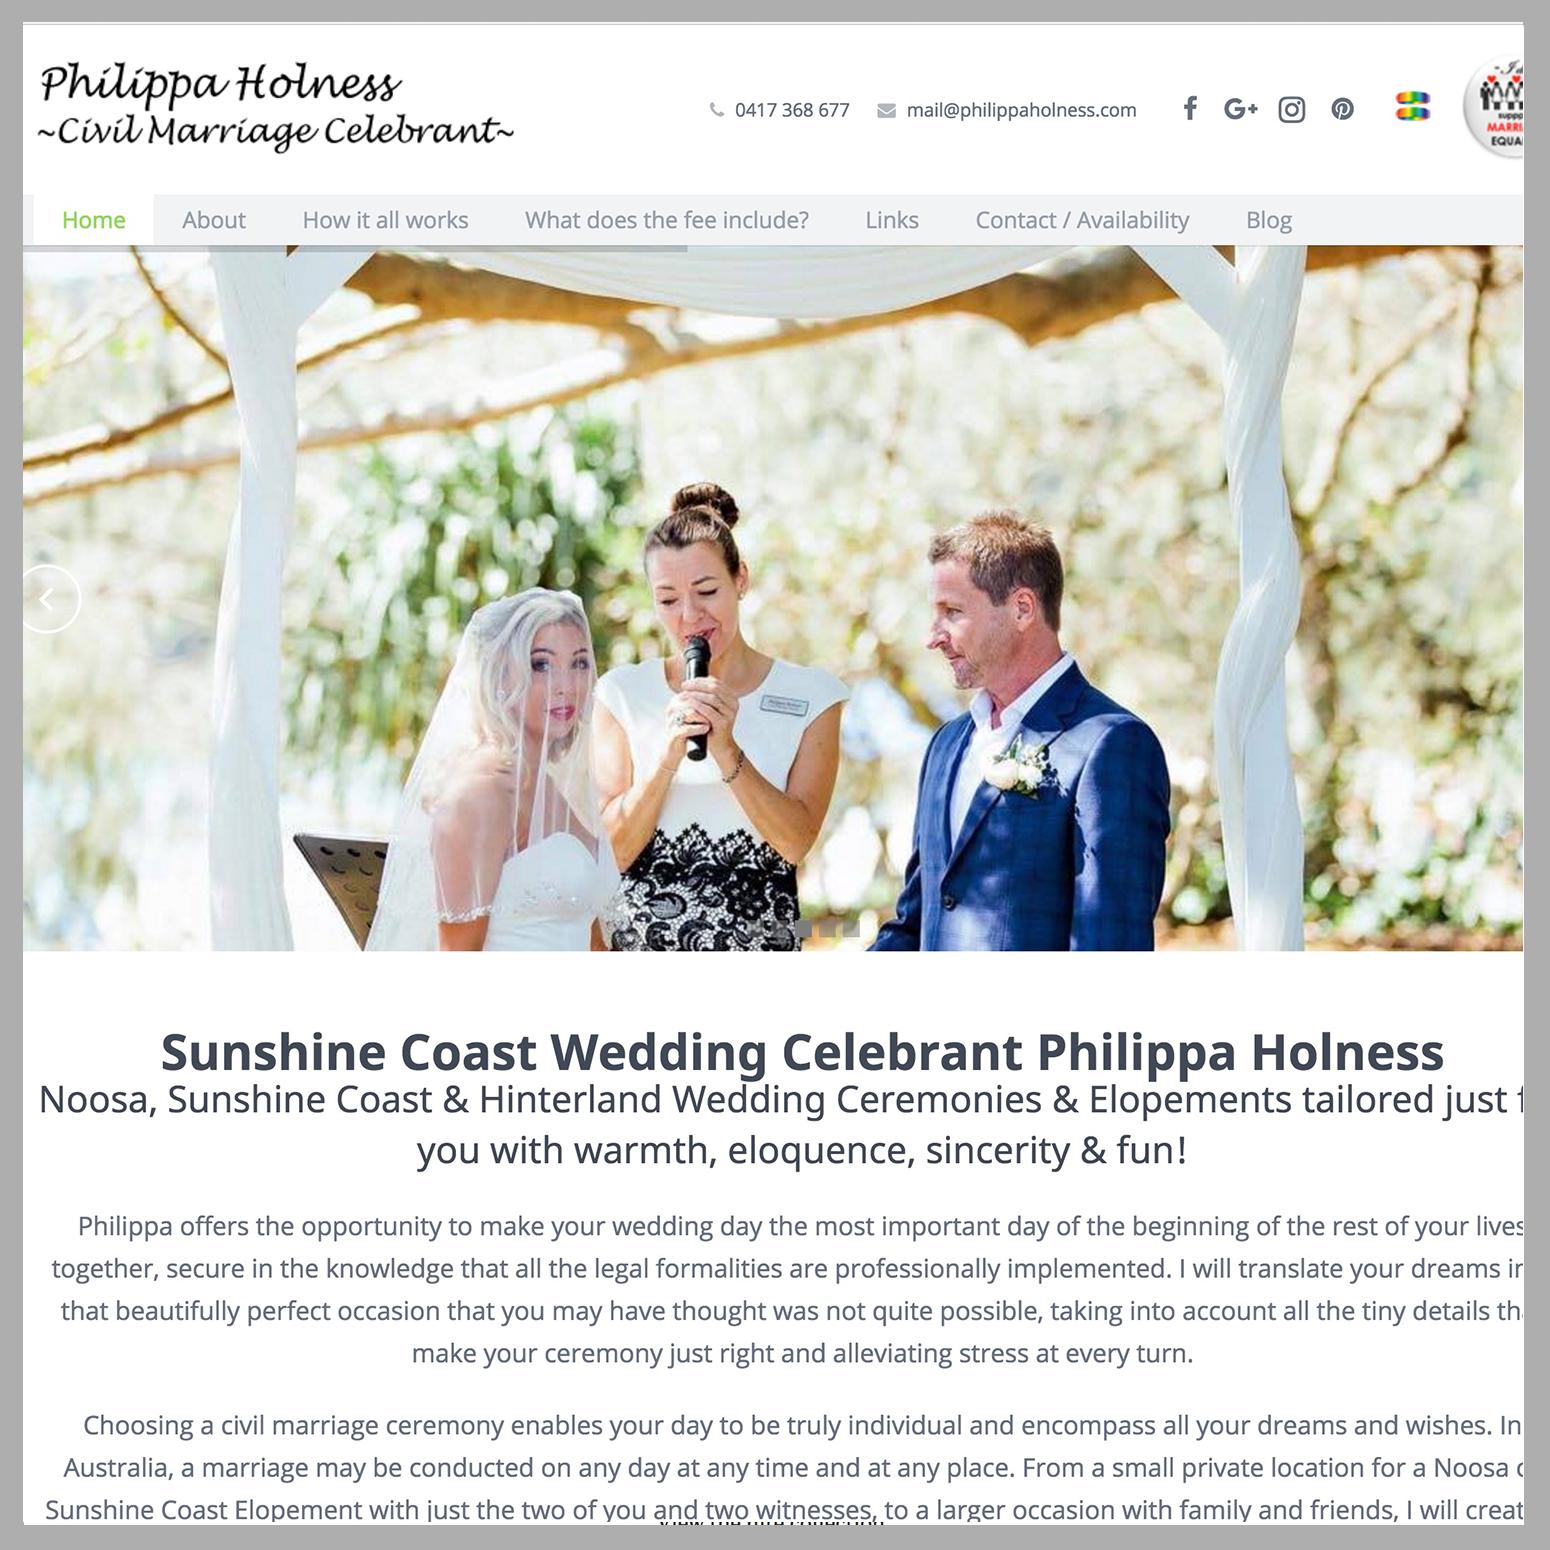 Philippa Holness Wedding Celebrant